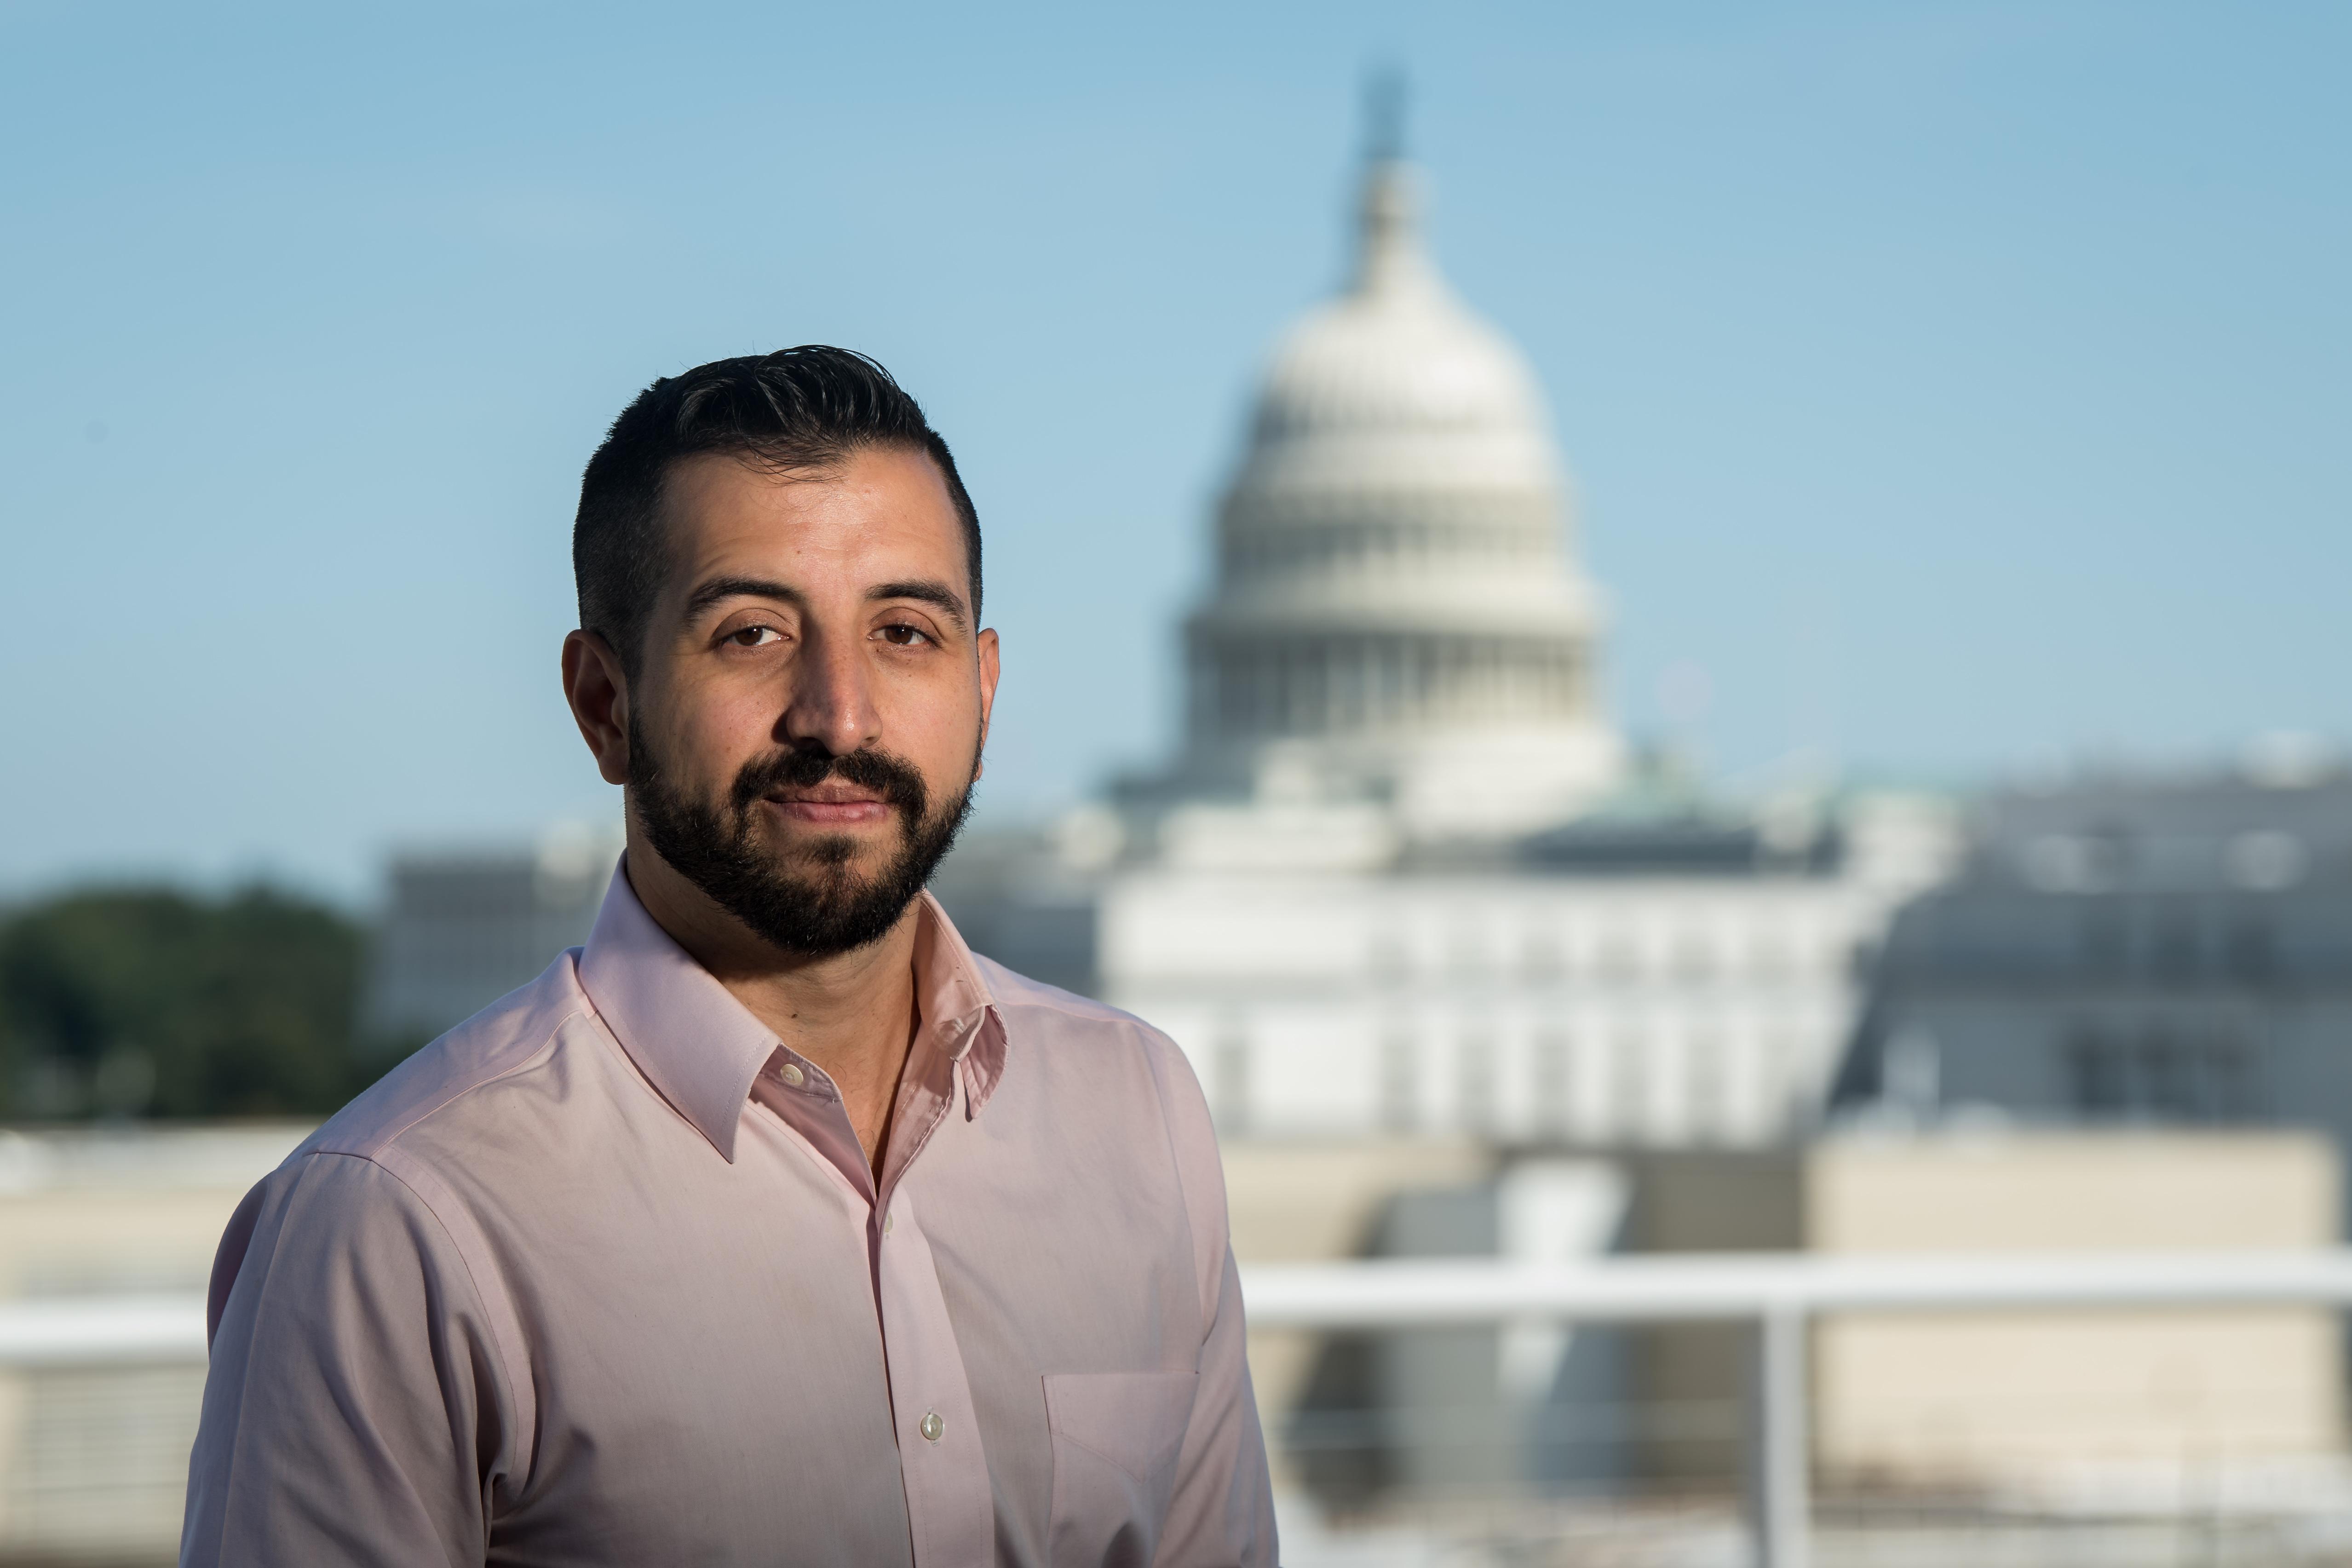 Digital Content Strategist Andres Almeida